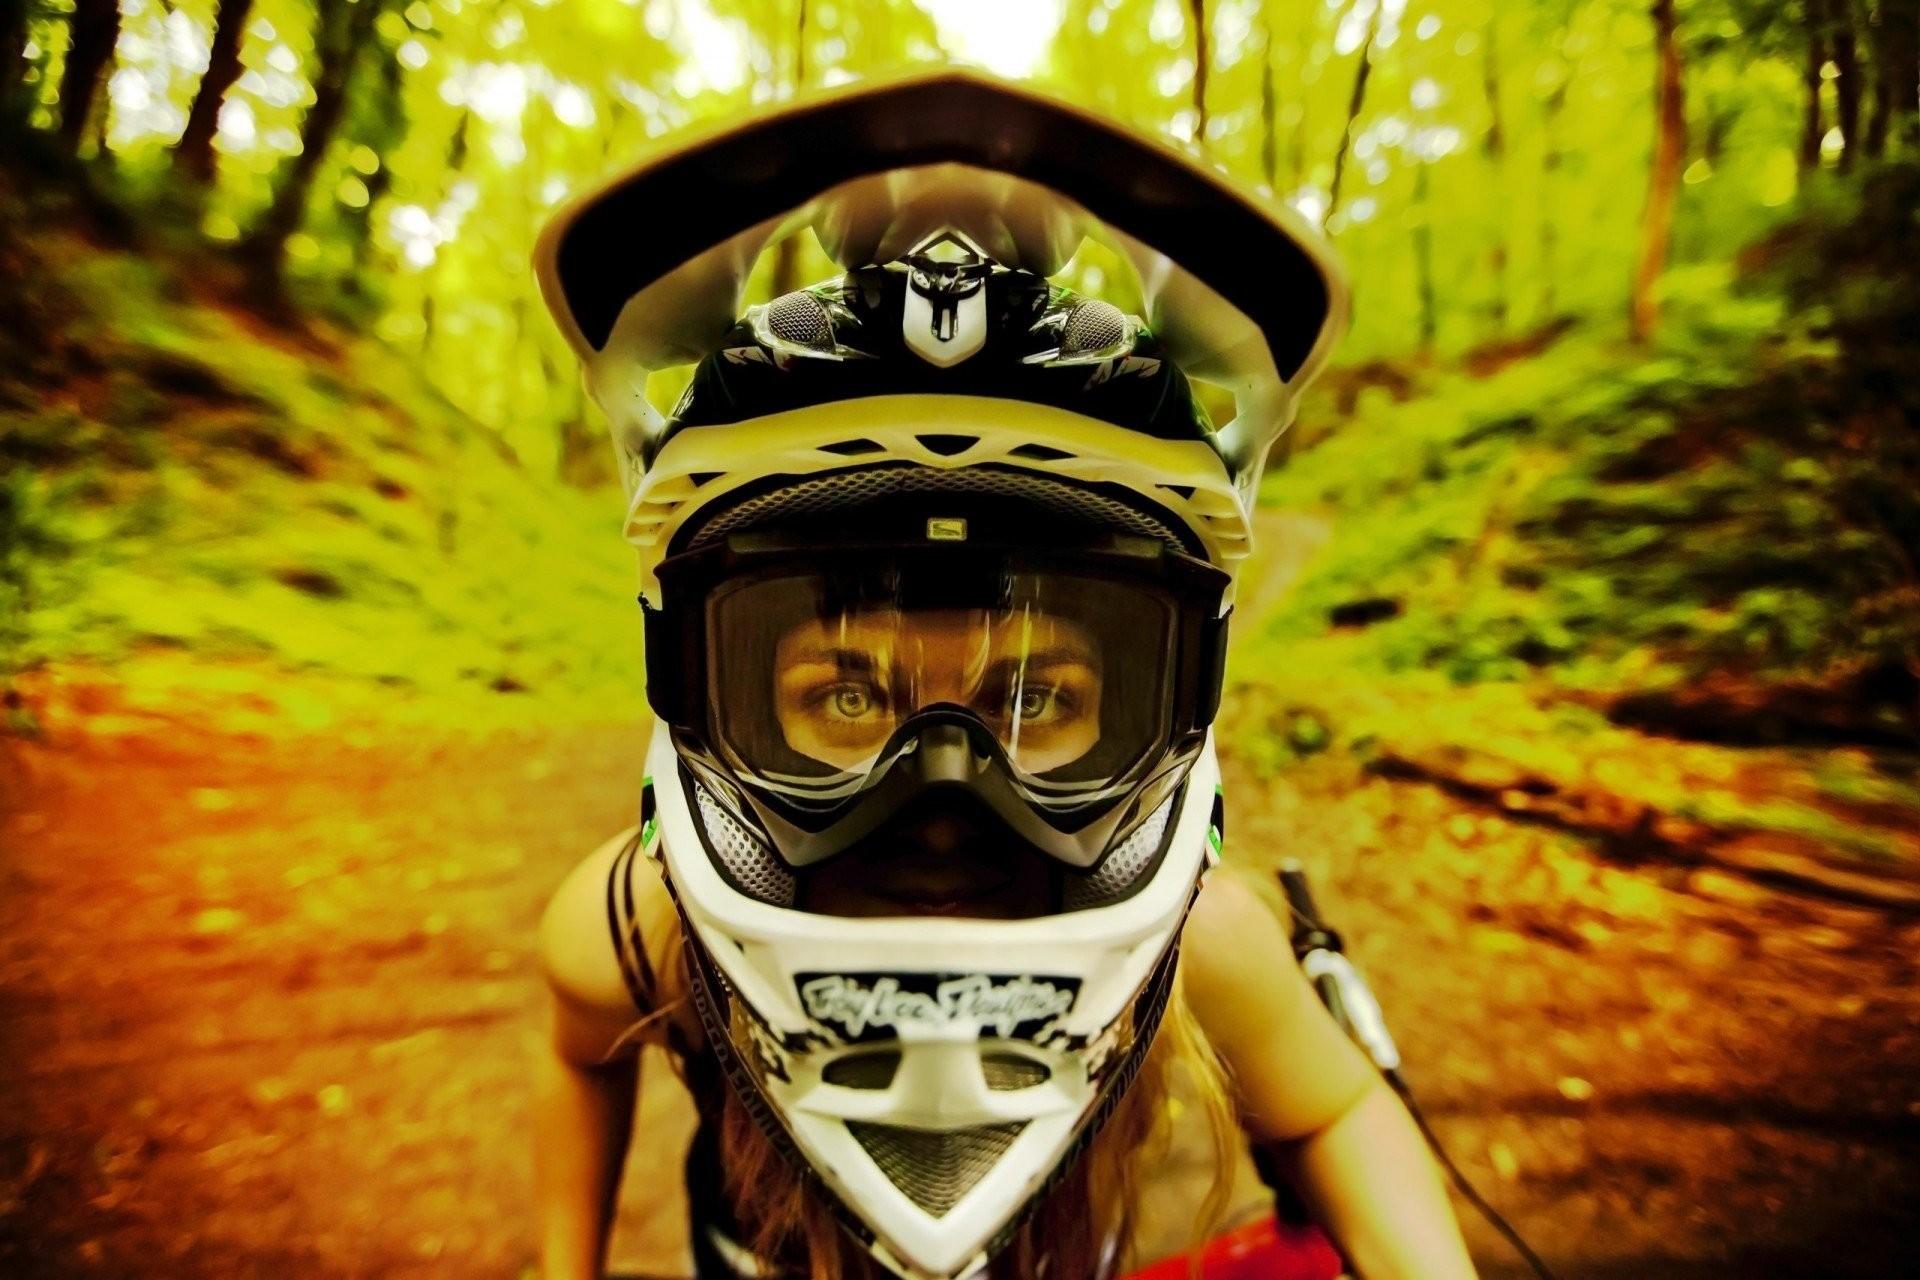 girl mtb dirt bike court nyashka